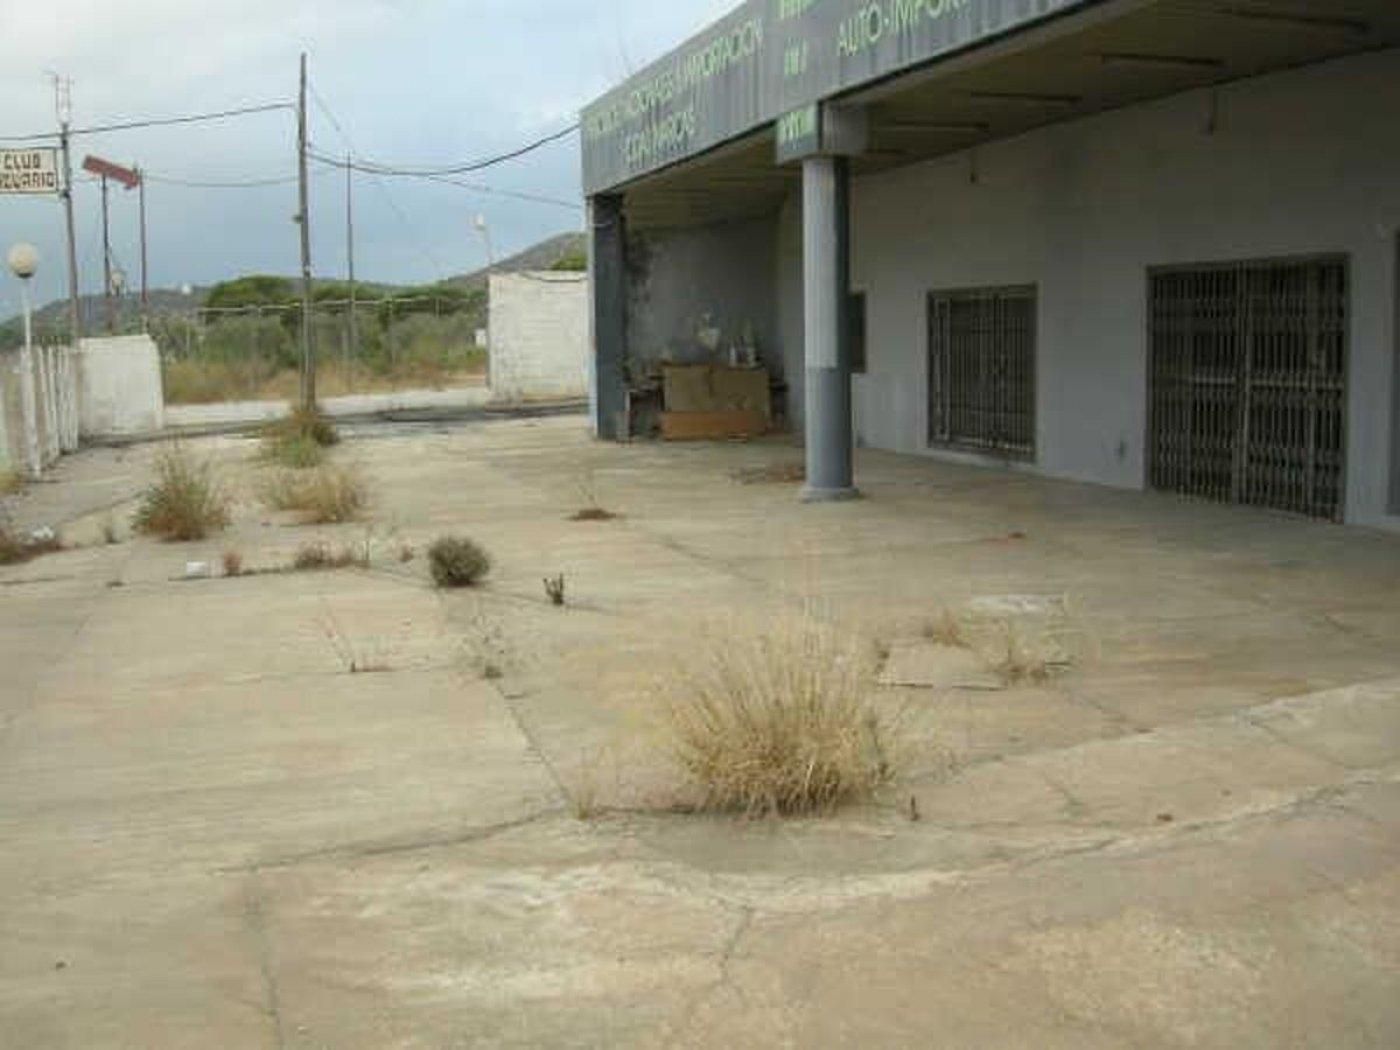 Barraca Industrial , Camp de tir, Venta - Alcanar (Tarragona)